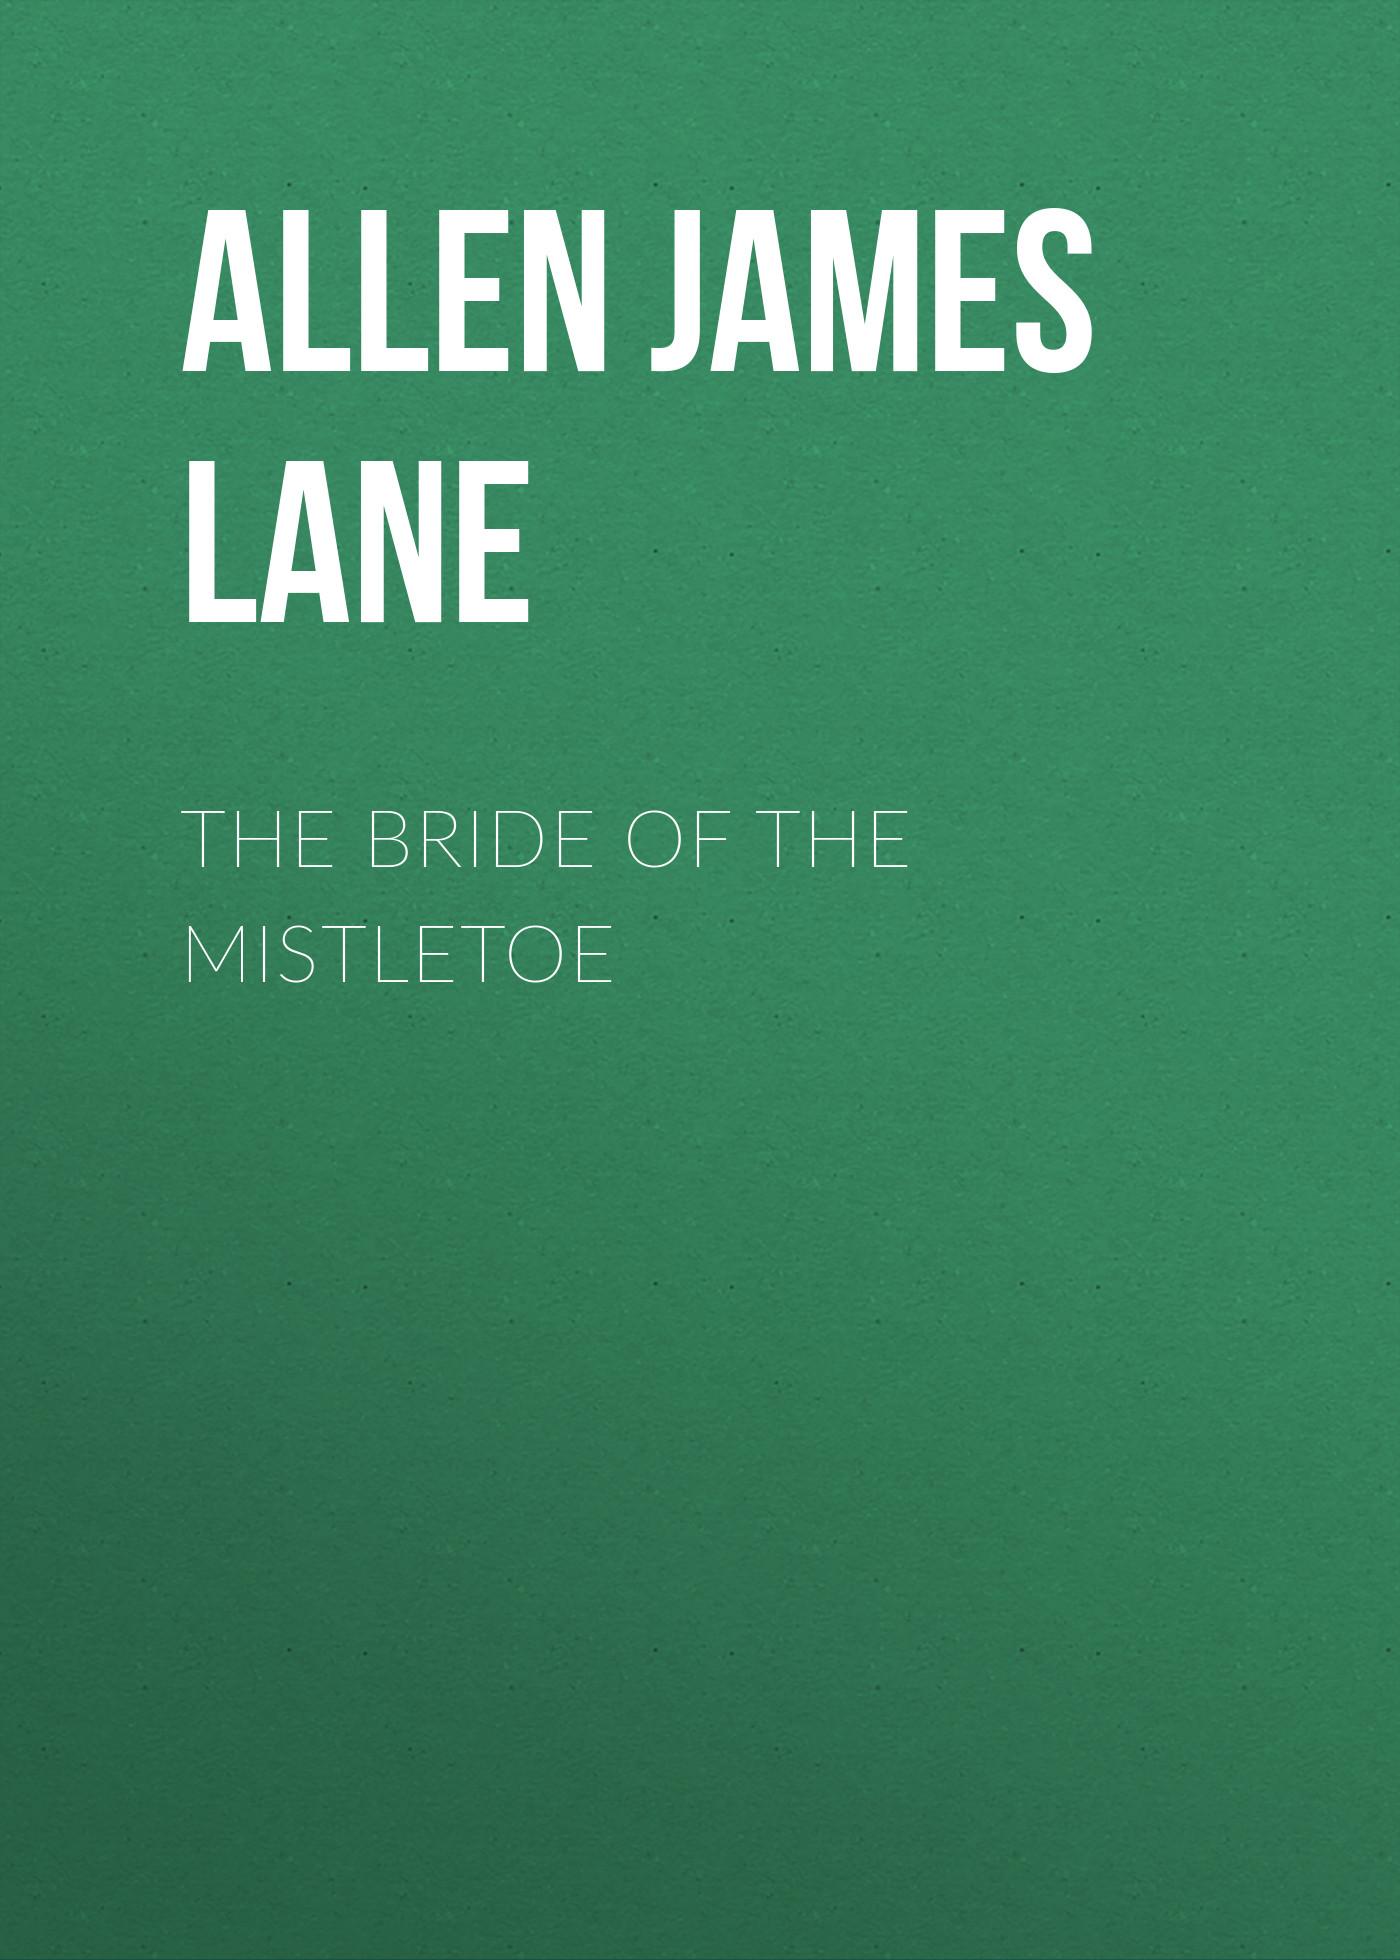 Allen James Lane The Bride of the Mistletoe louise allen moonlight and mistletoe